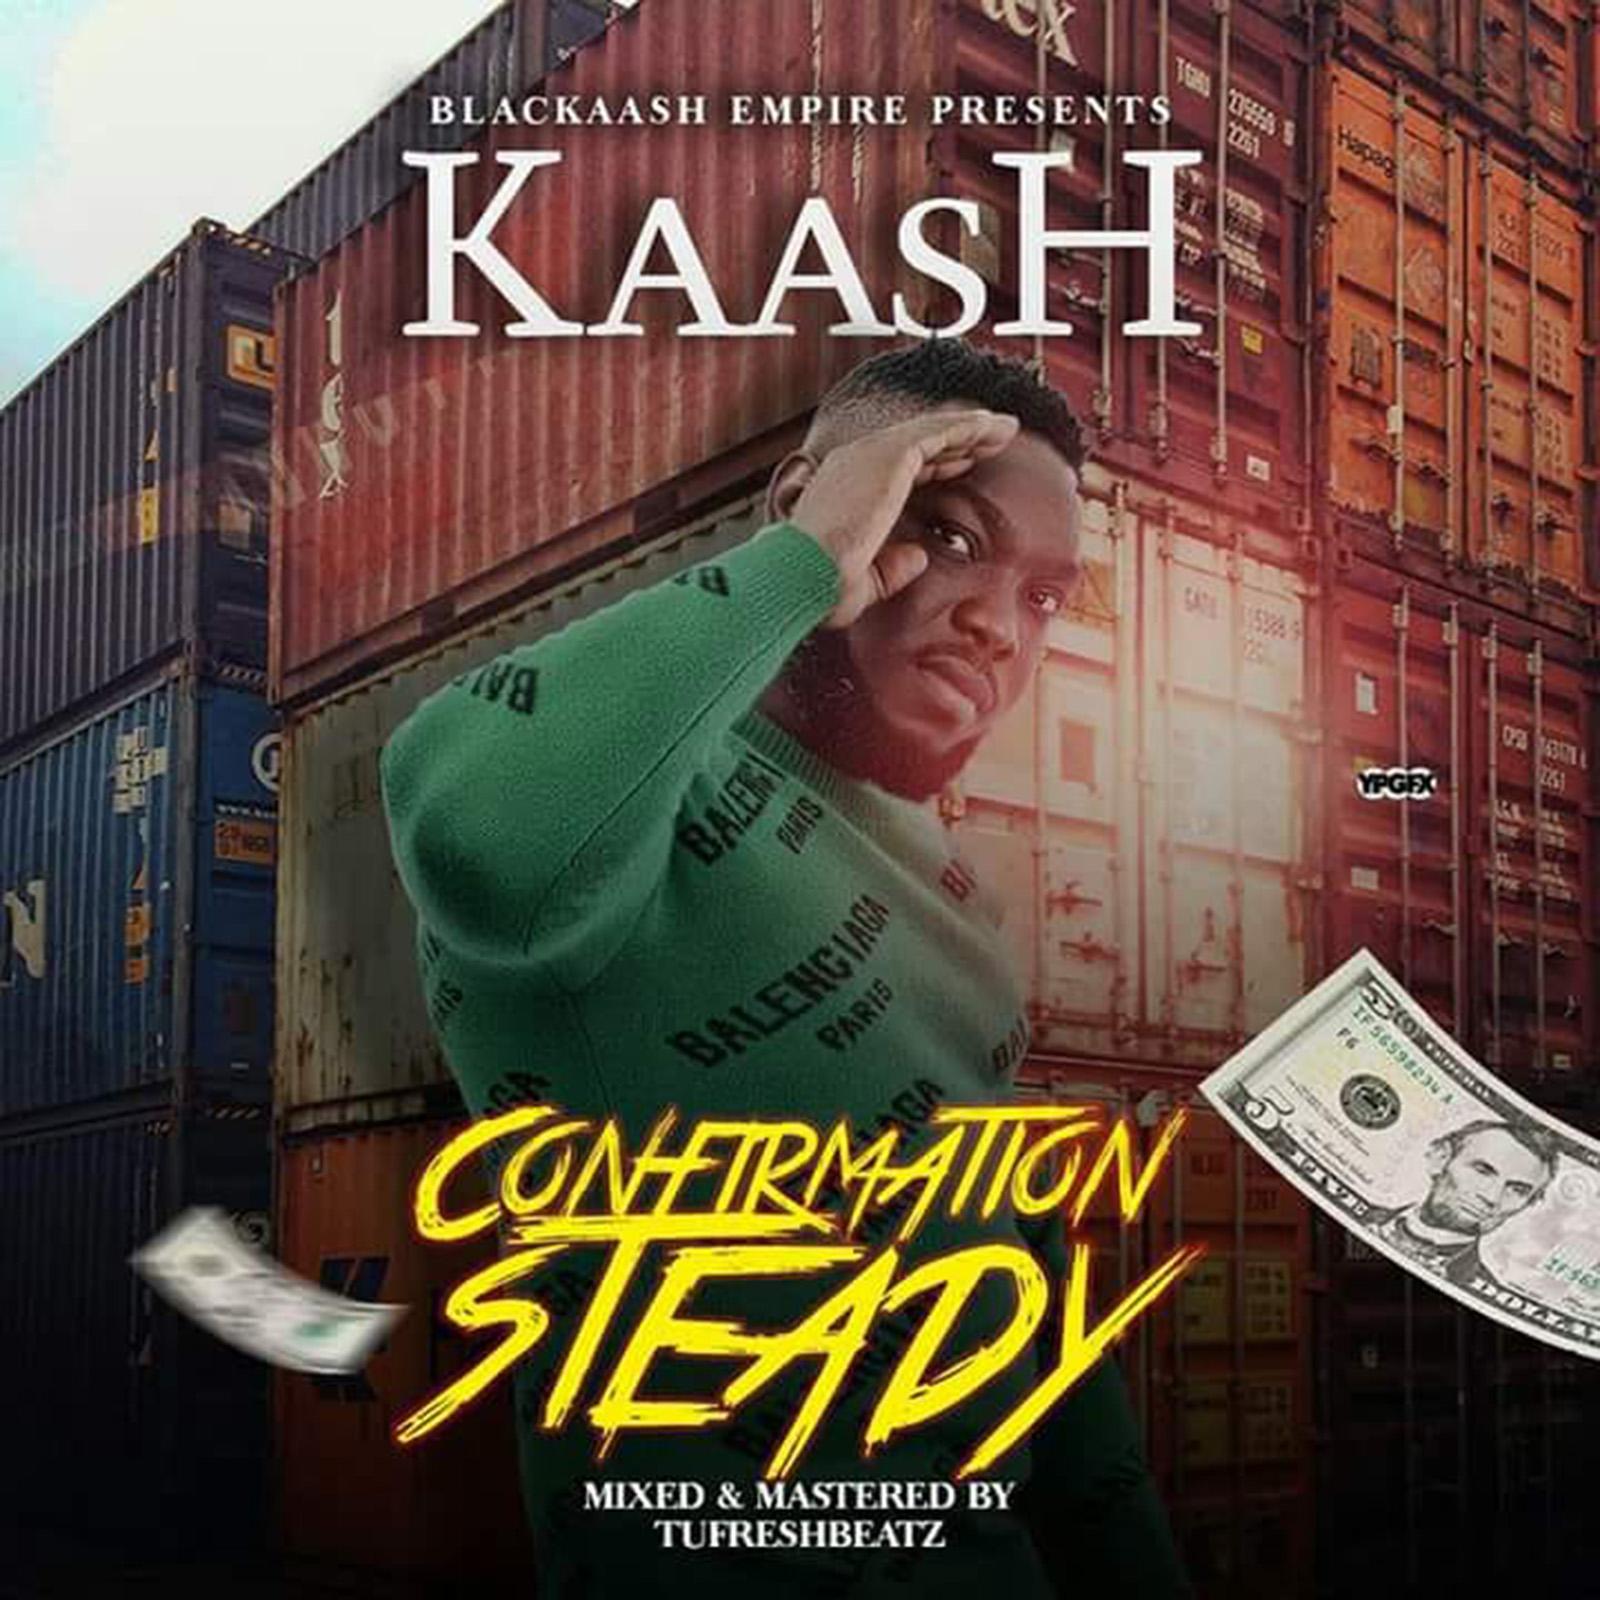 Confirmation Steady by Kaash